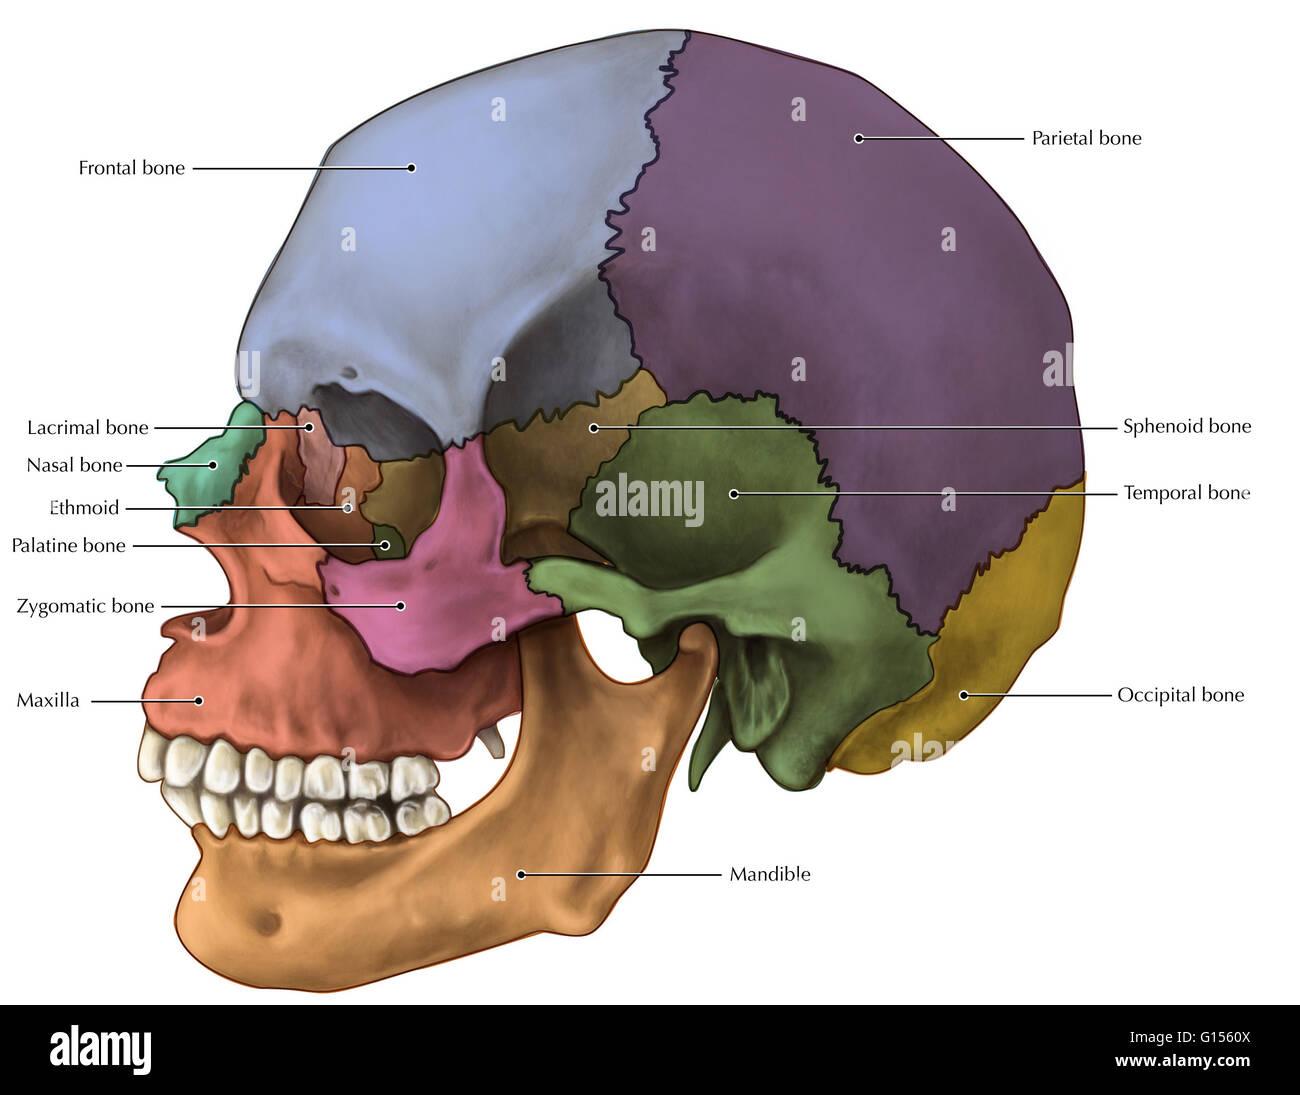 Lateral Skull Stockfotos & Lateral Skull Bilder - Seite 3 - Alamy